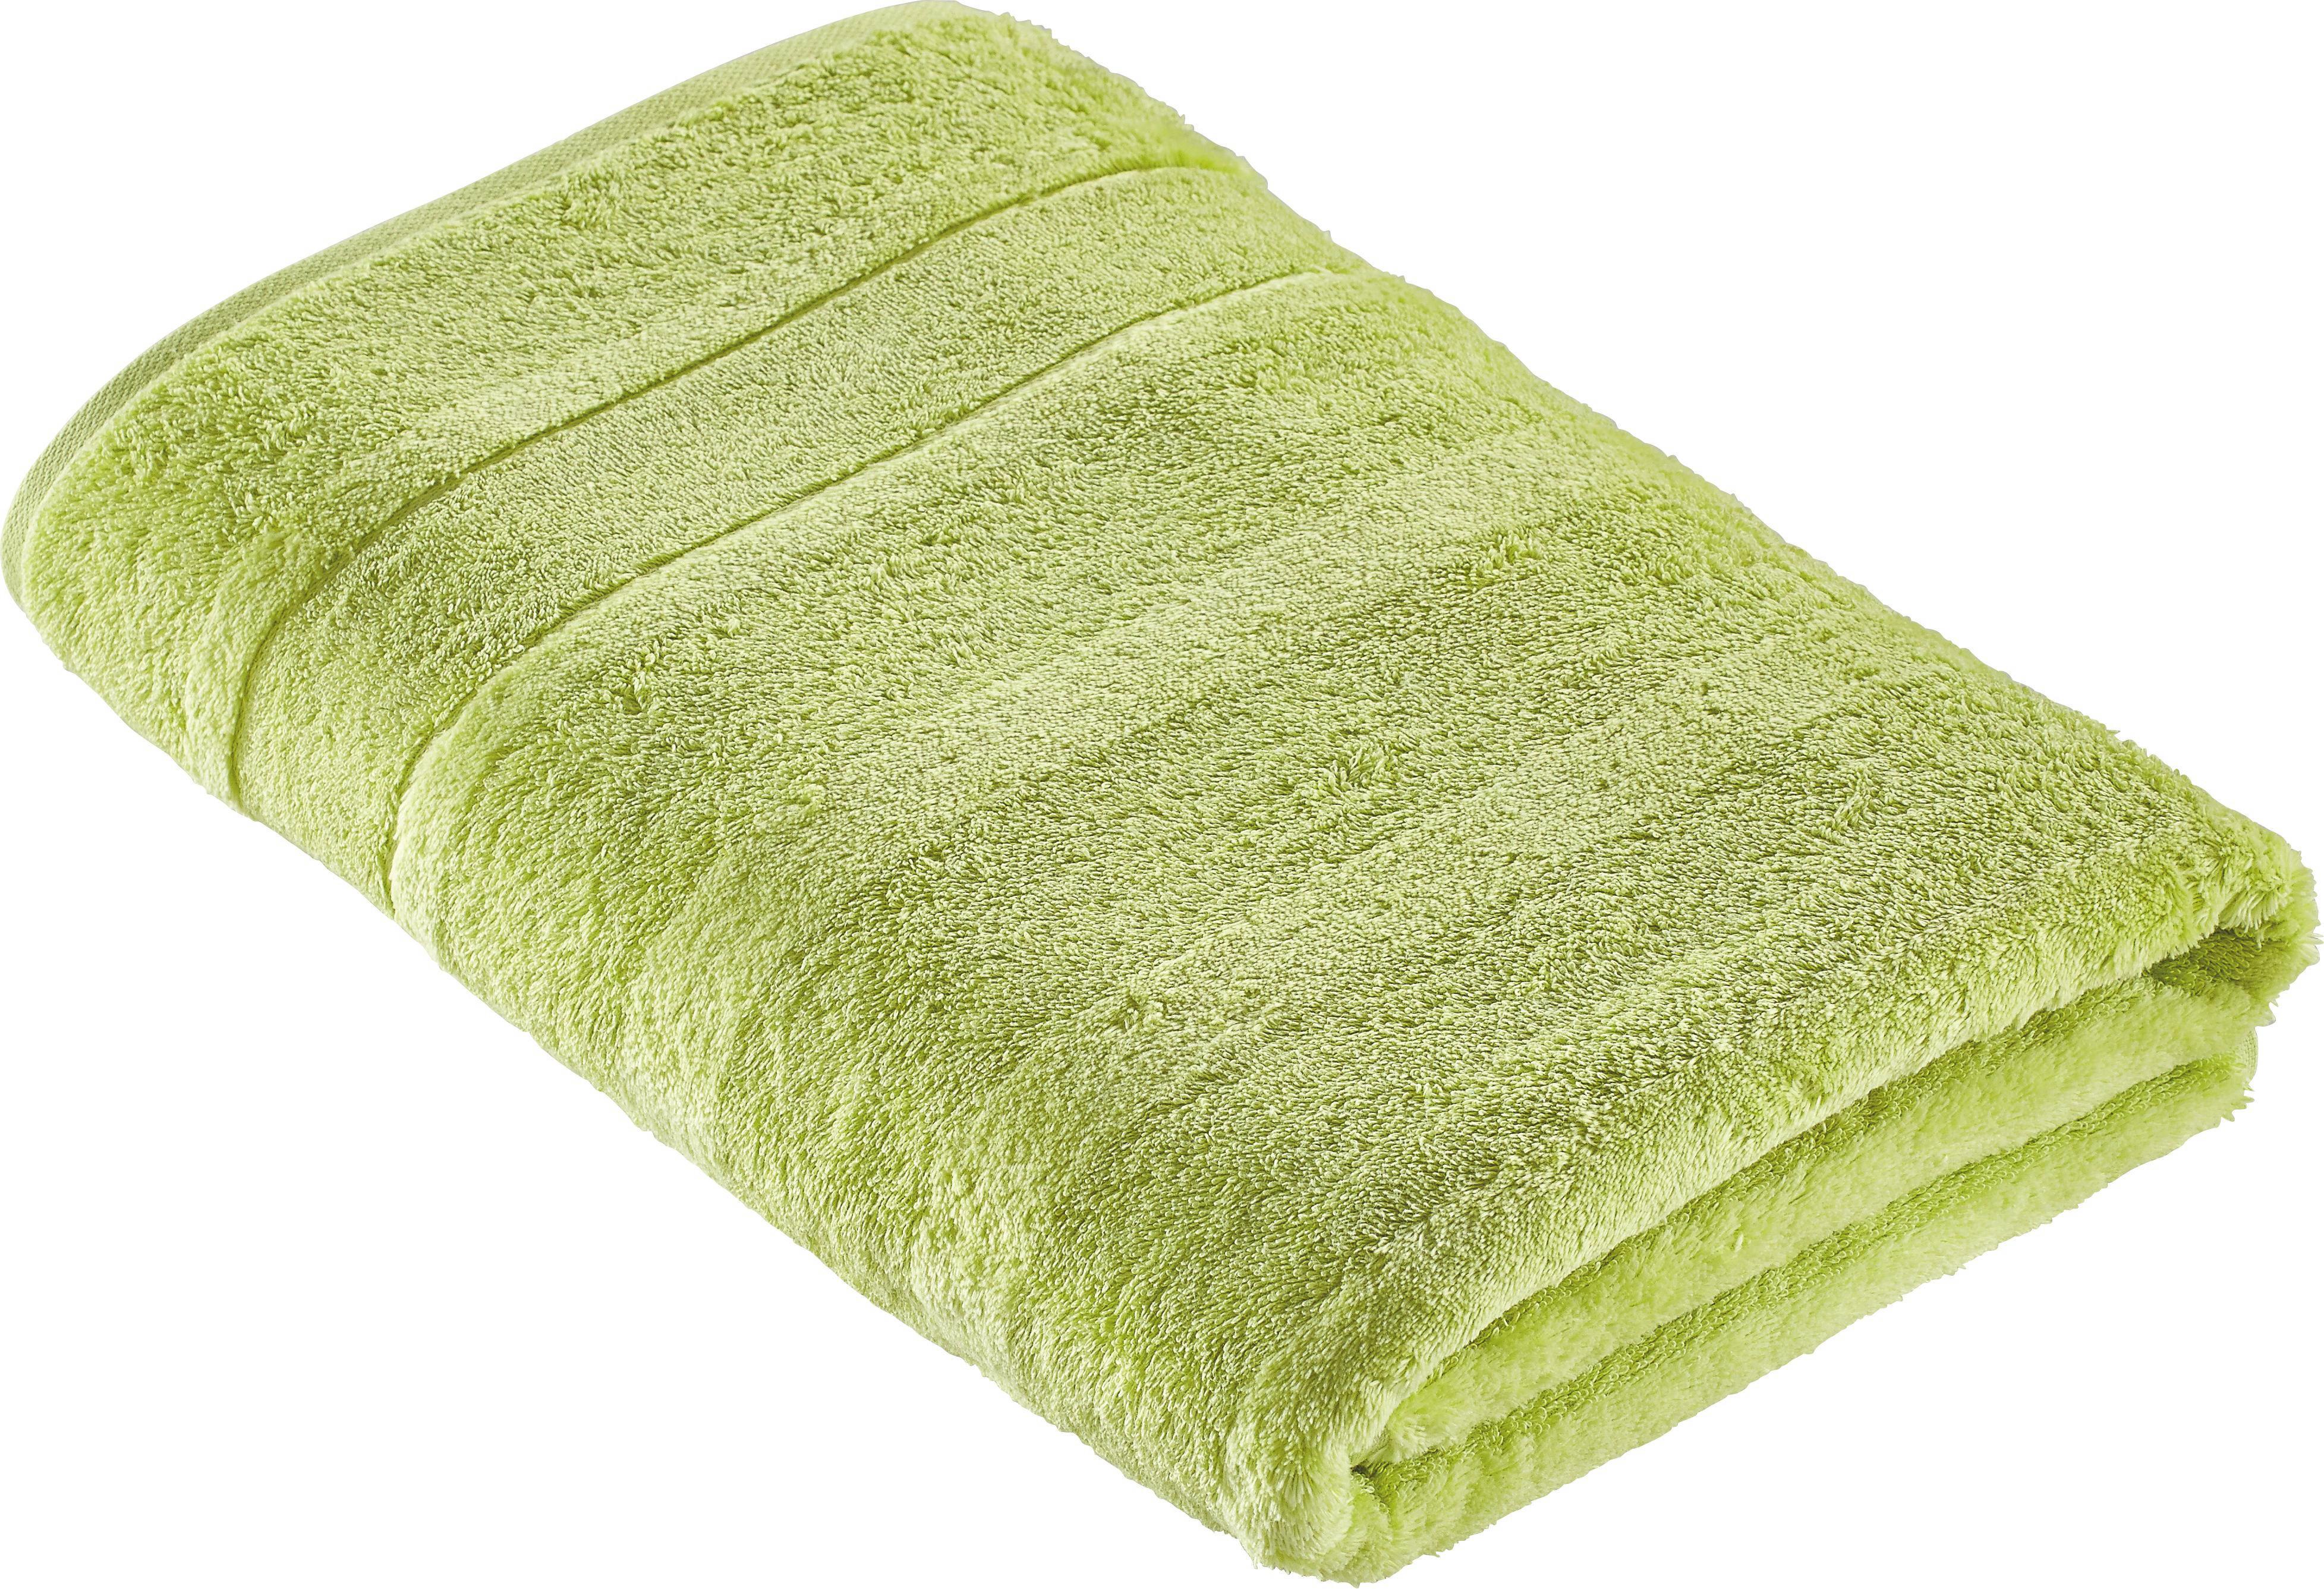 DUSCHTUCH 80/160 cm - Grün, Textil (80/160cm) - CAWOE